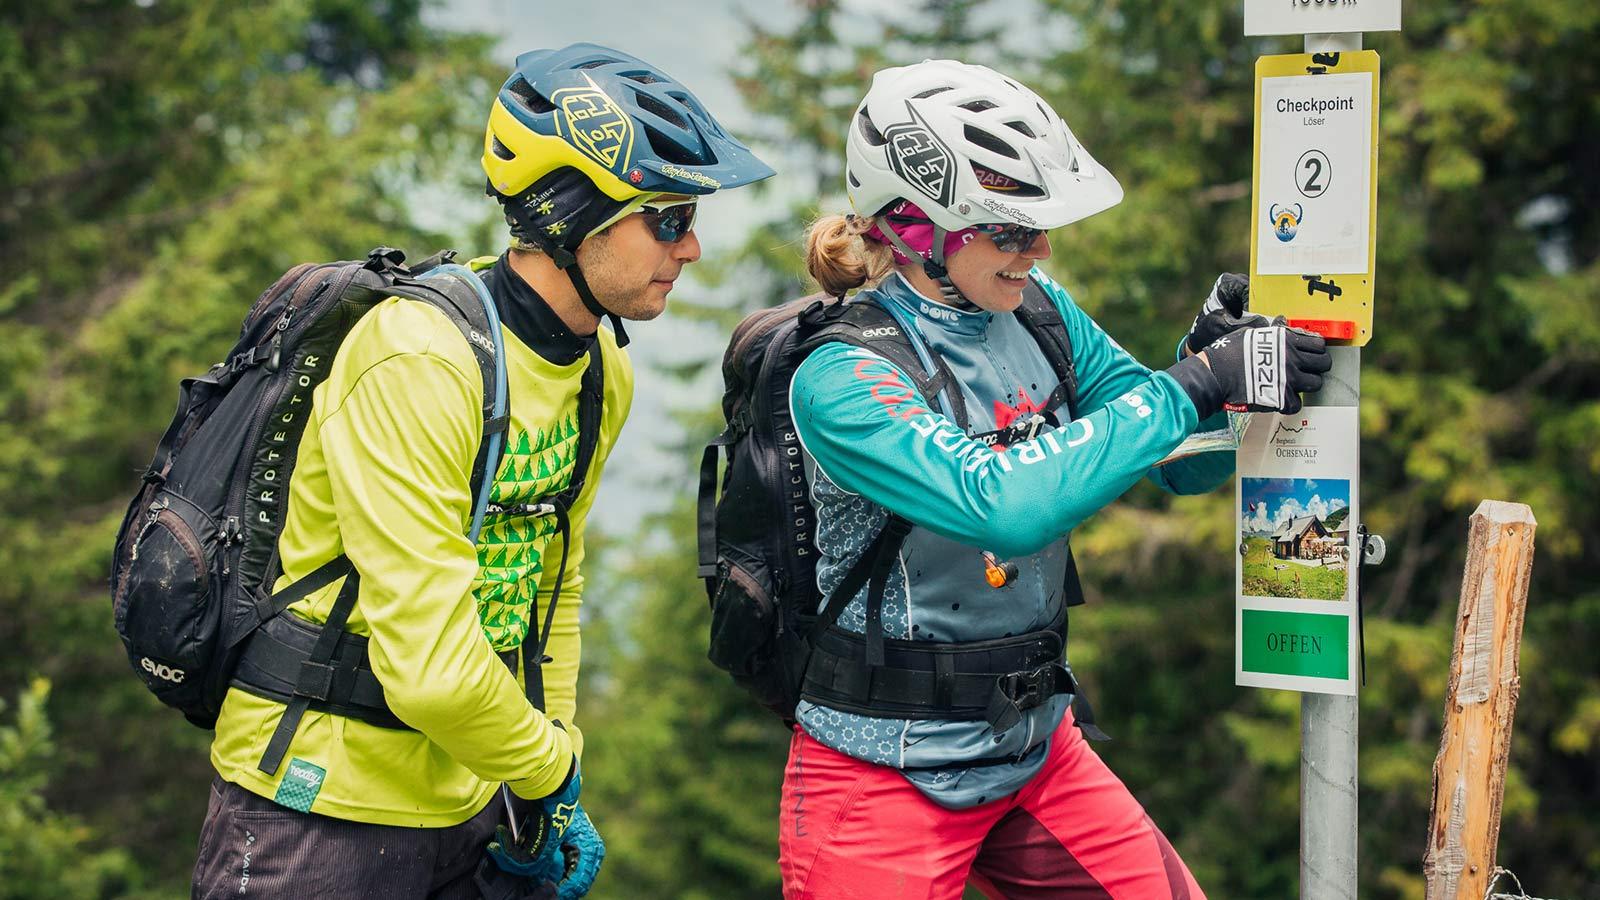 Event Hörnli Trailjagd 2017 - Checkpoint